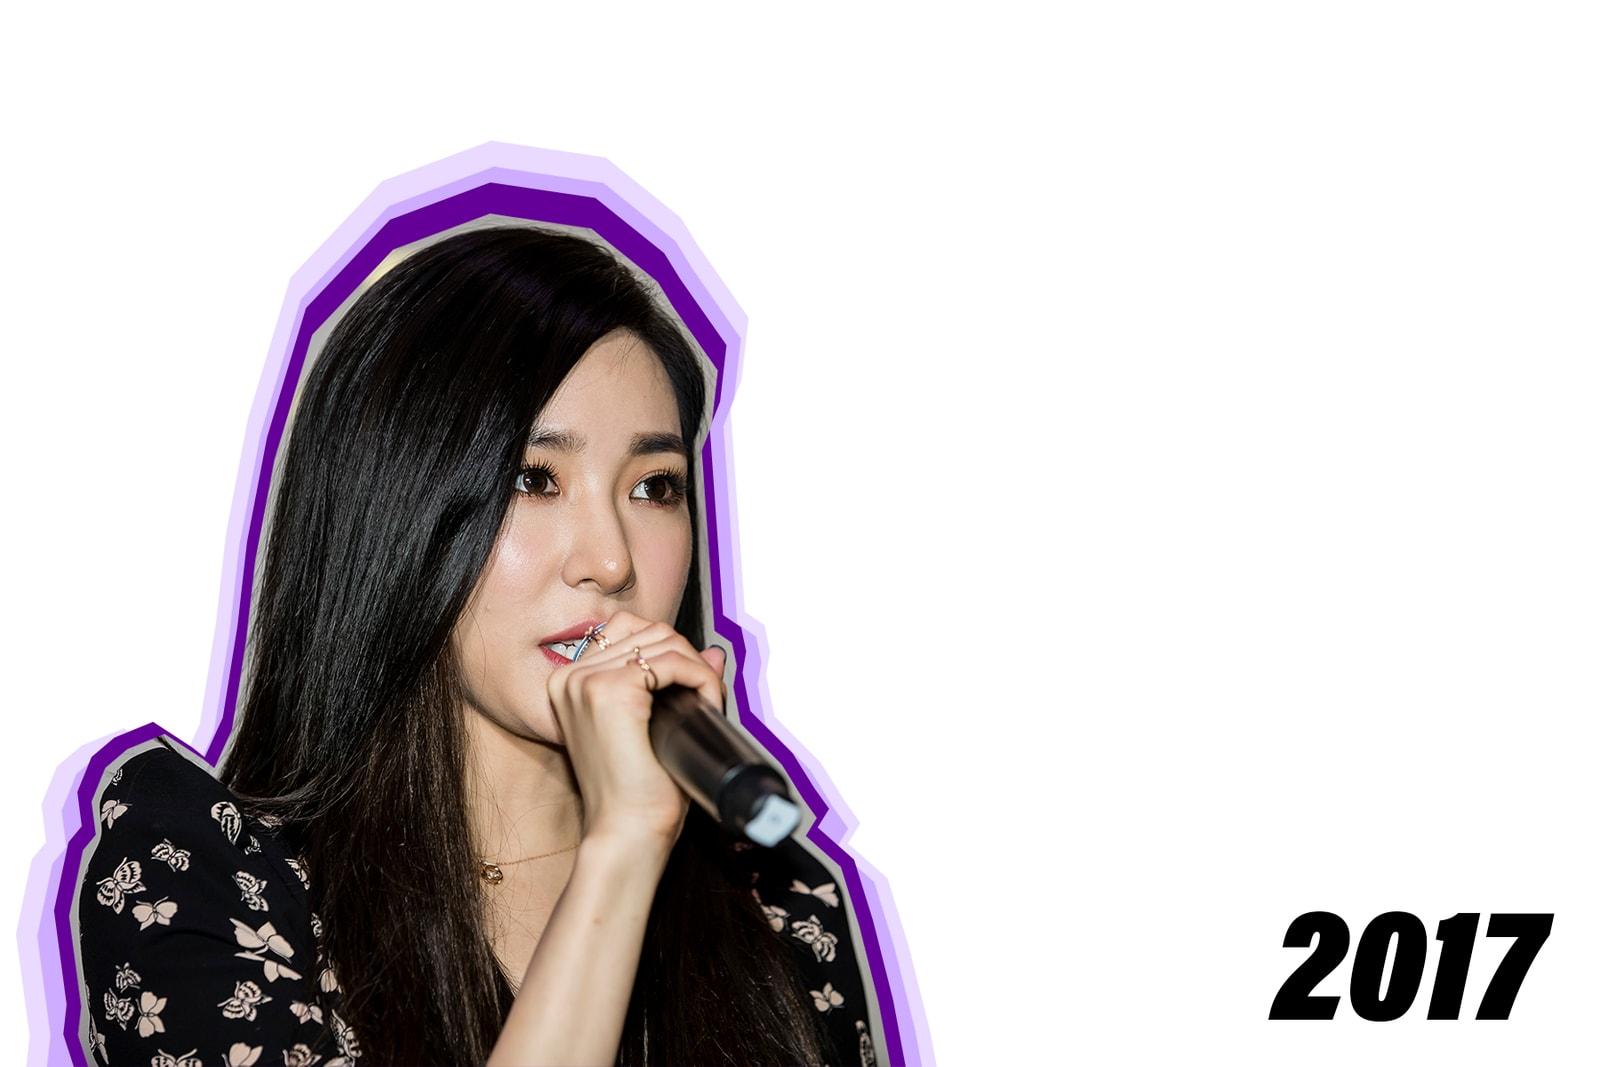 2010s k-pop highlights timeline korea blackpink bts psy sm yg jyp tvxq big bang seungri g-dragon red velvet music entertainment